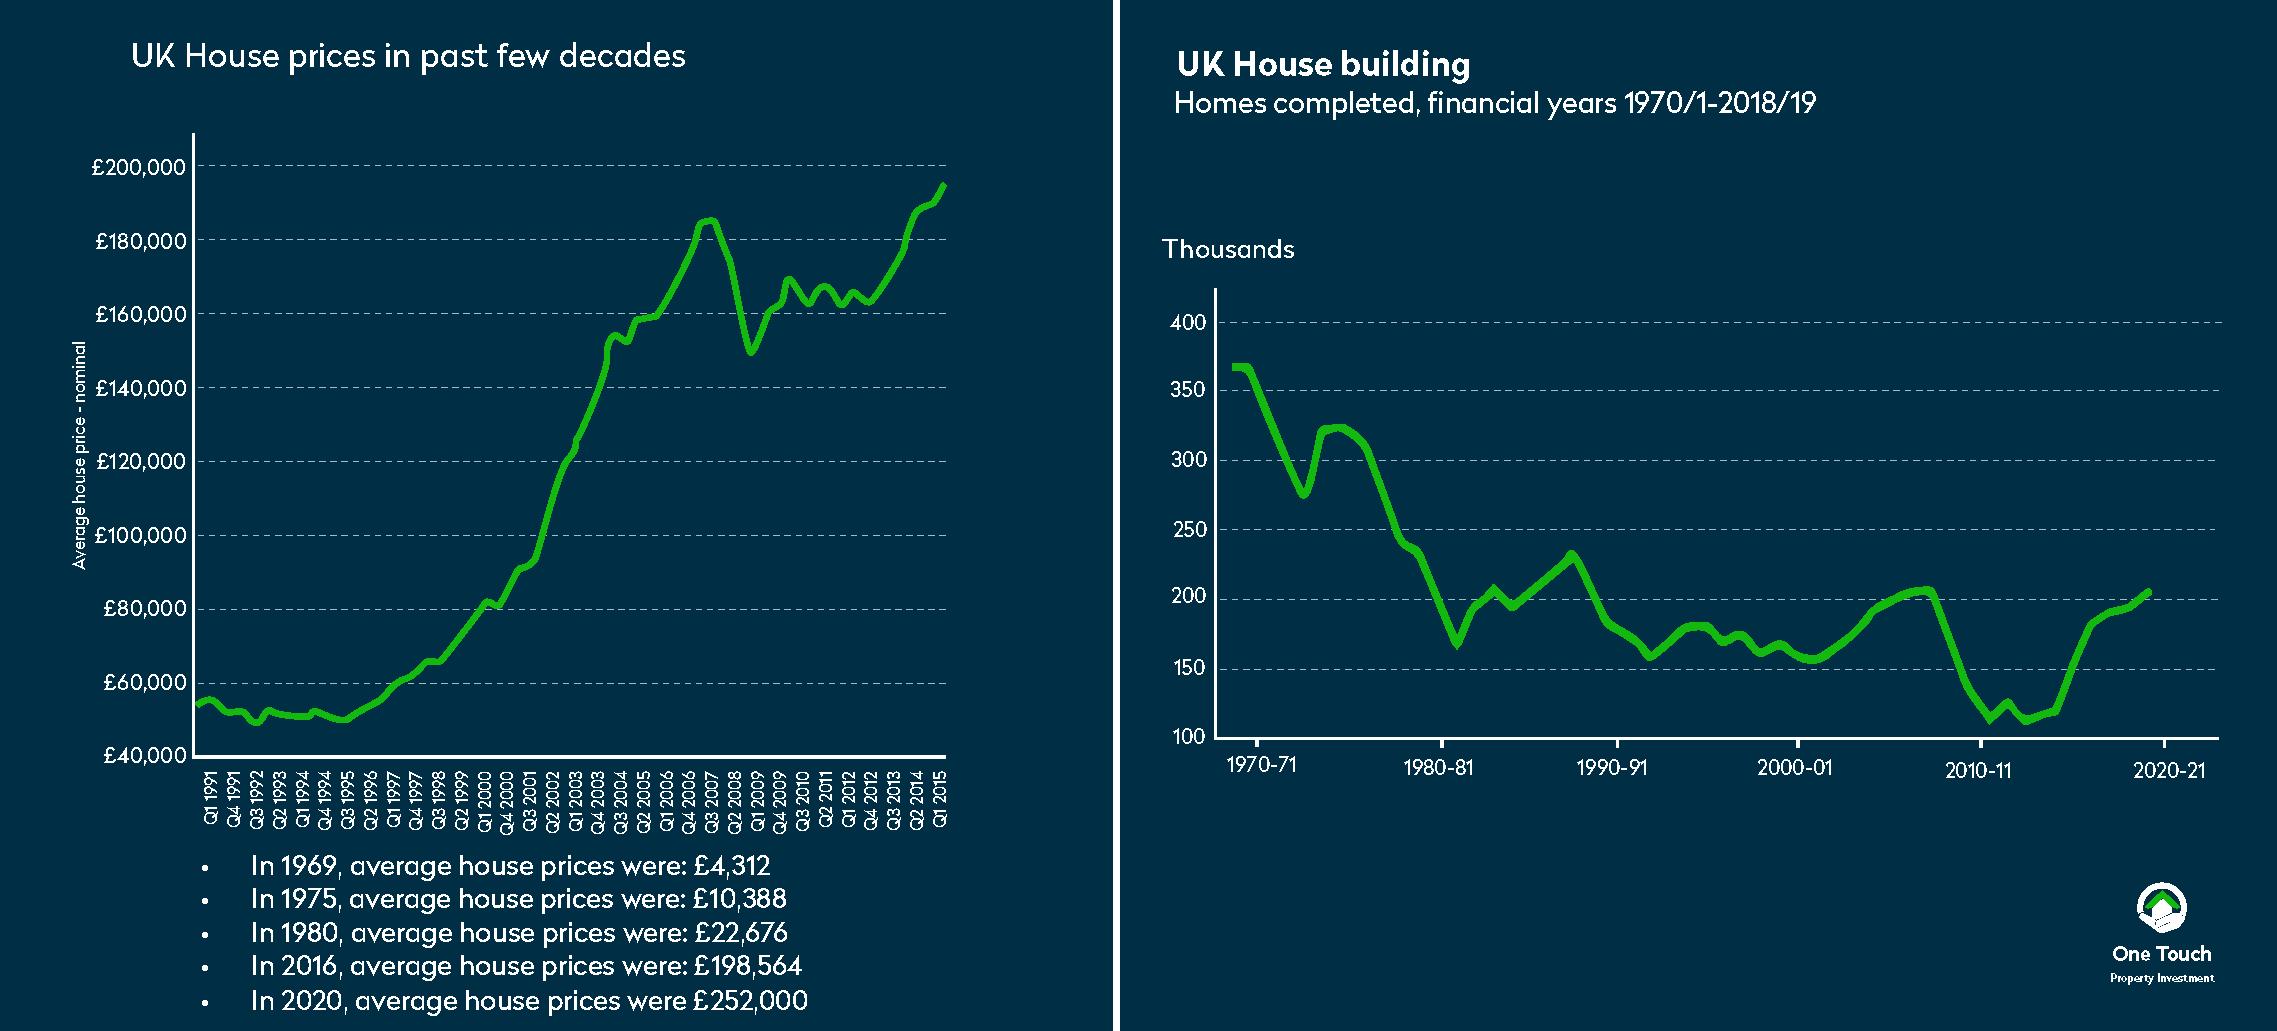 UK house building vs population growth